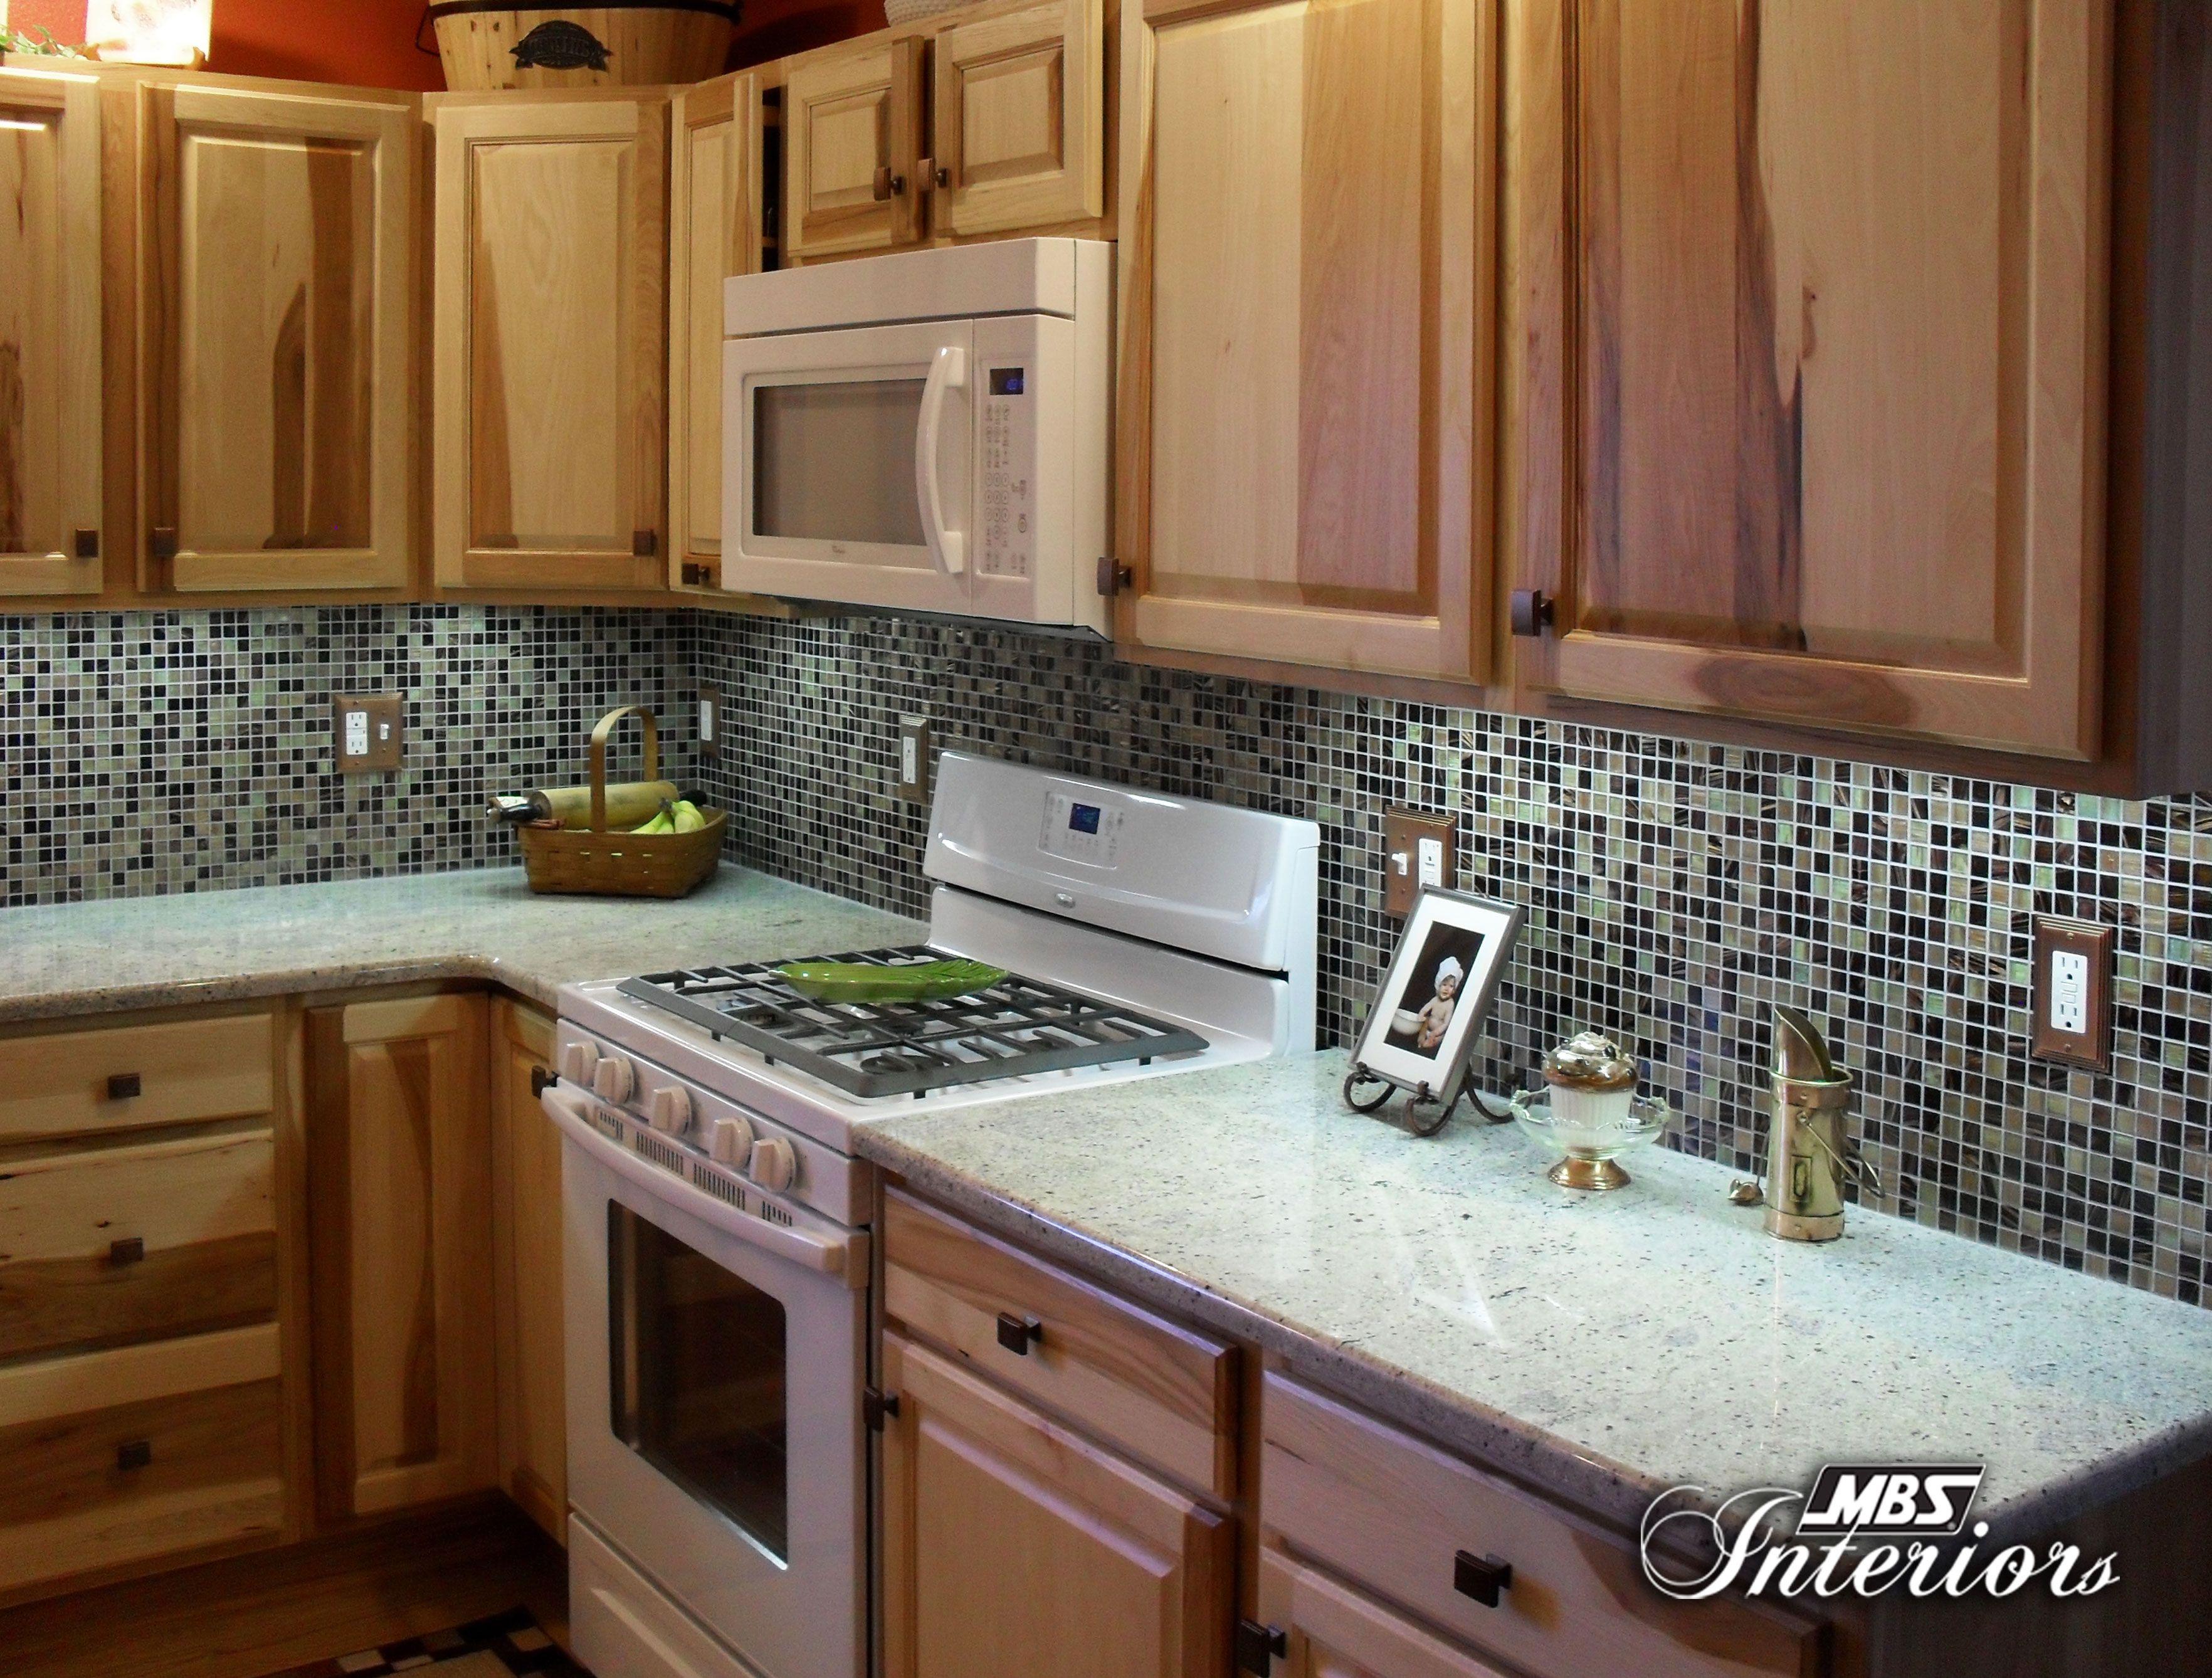 hickory farmhouse kitchen hickory kitchen rustic kitchen kitchen on farmhouse kitchen hickory cabinets id=26755